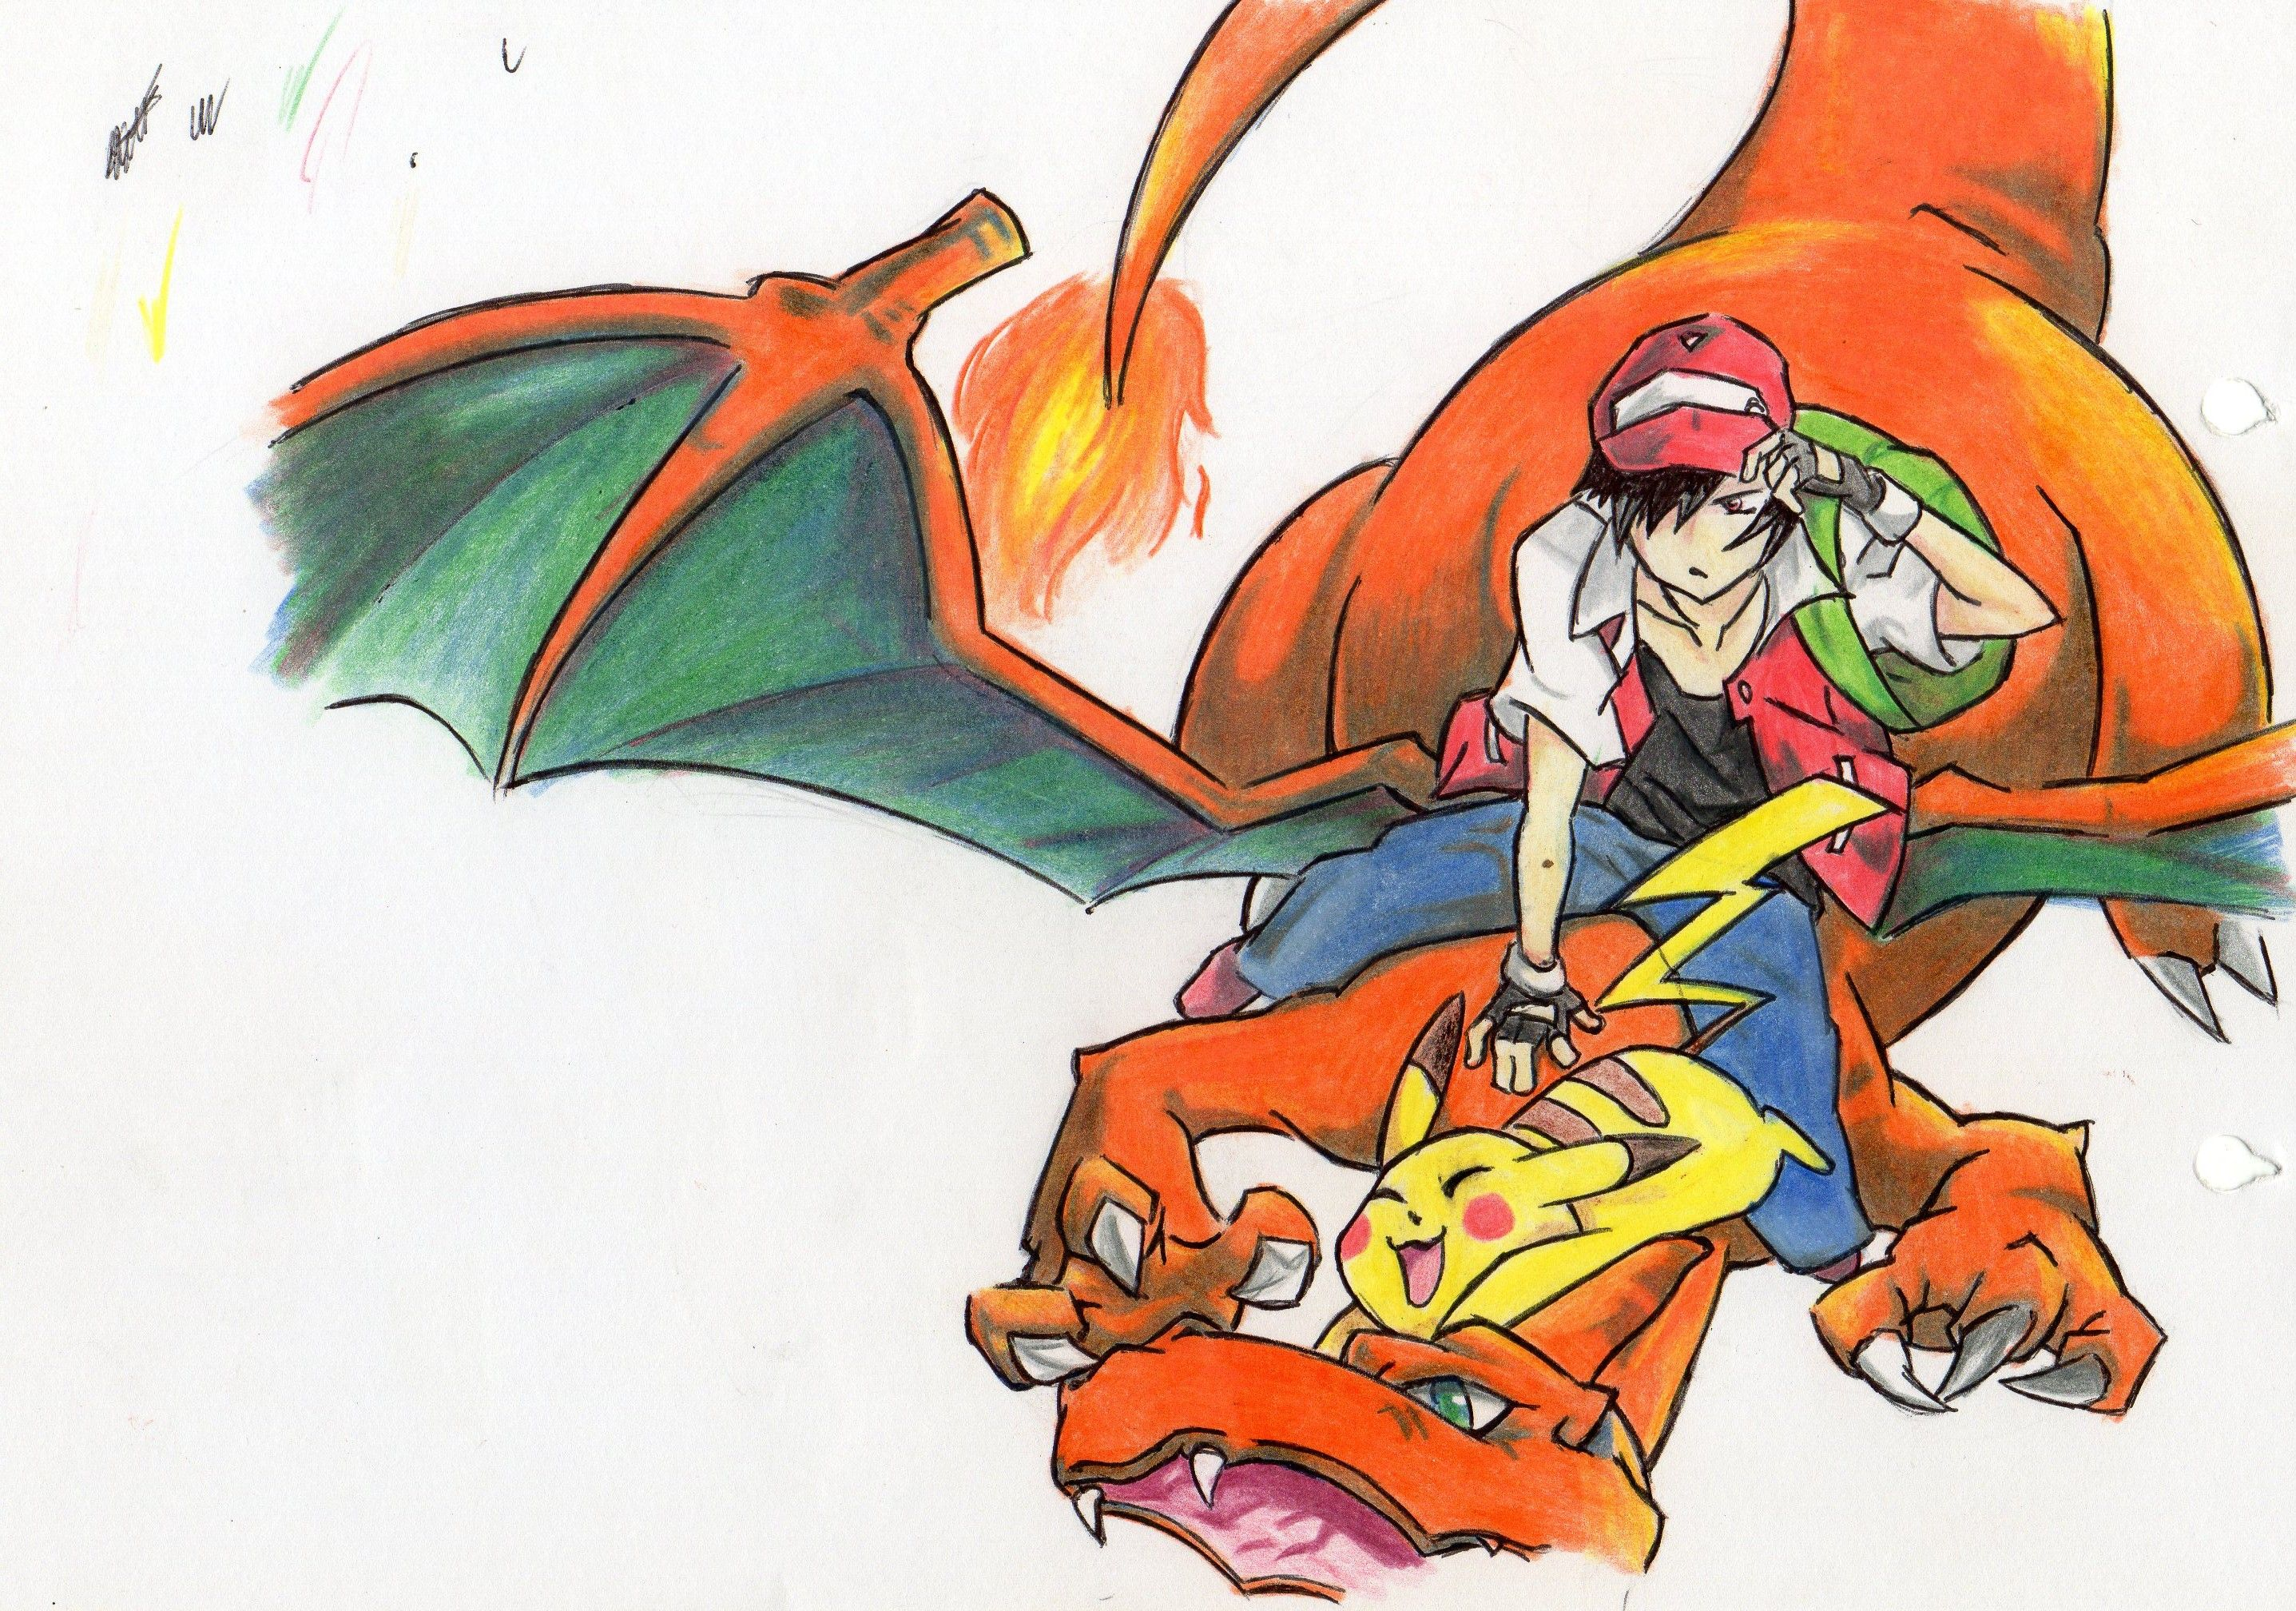 #pokemon #red #trainer #charizard #pikachu #fly #fire # ...